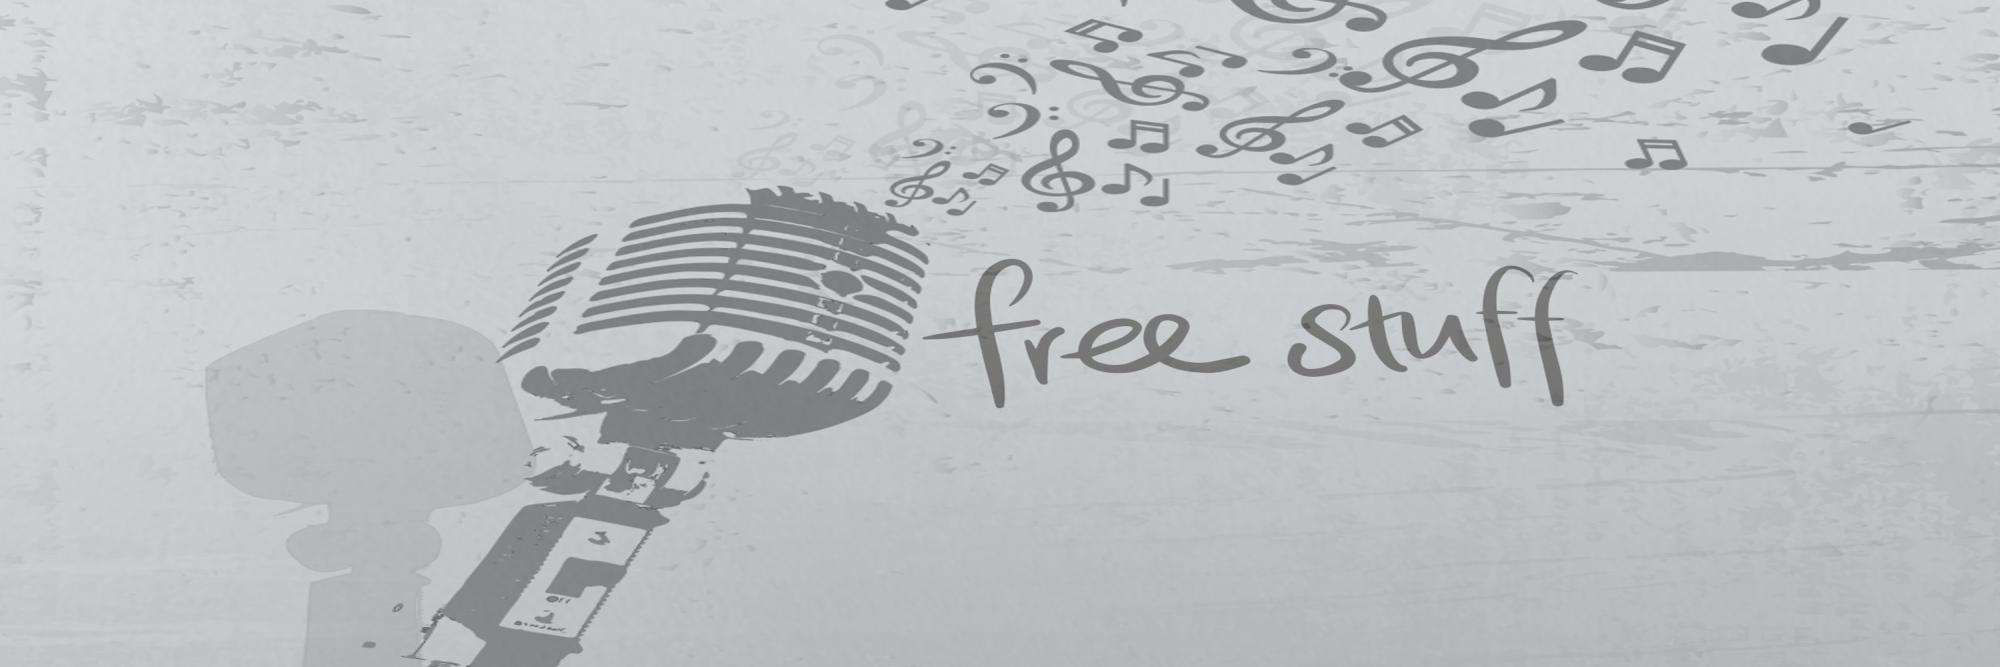 -banner-free-stuff 3